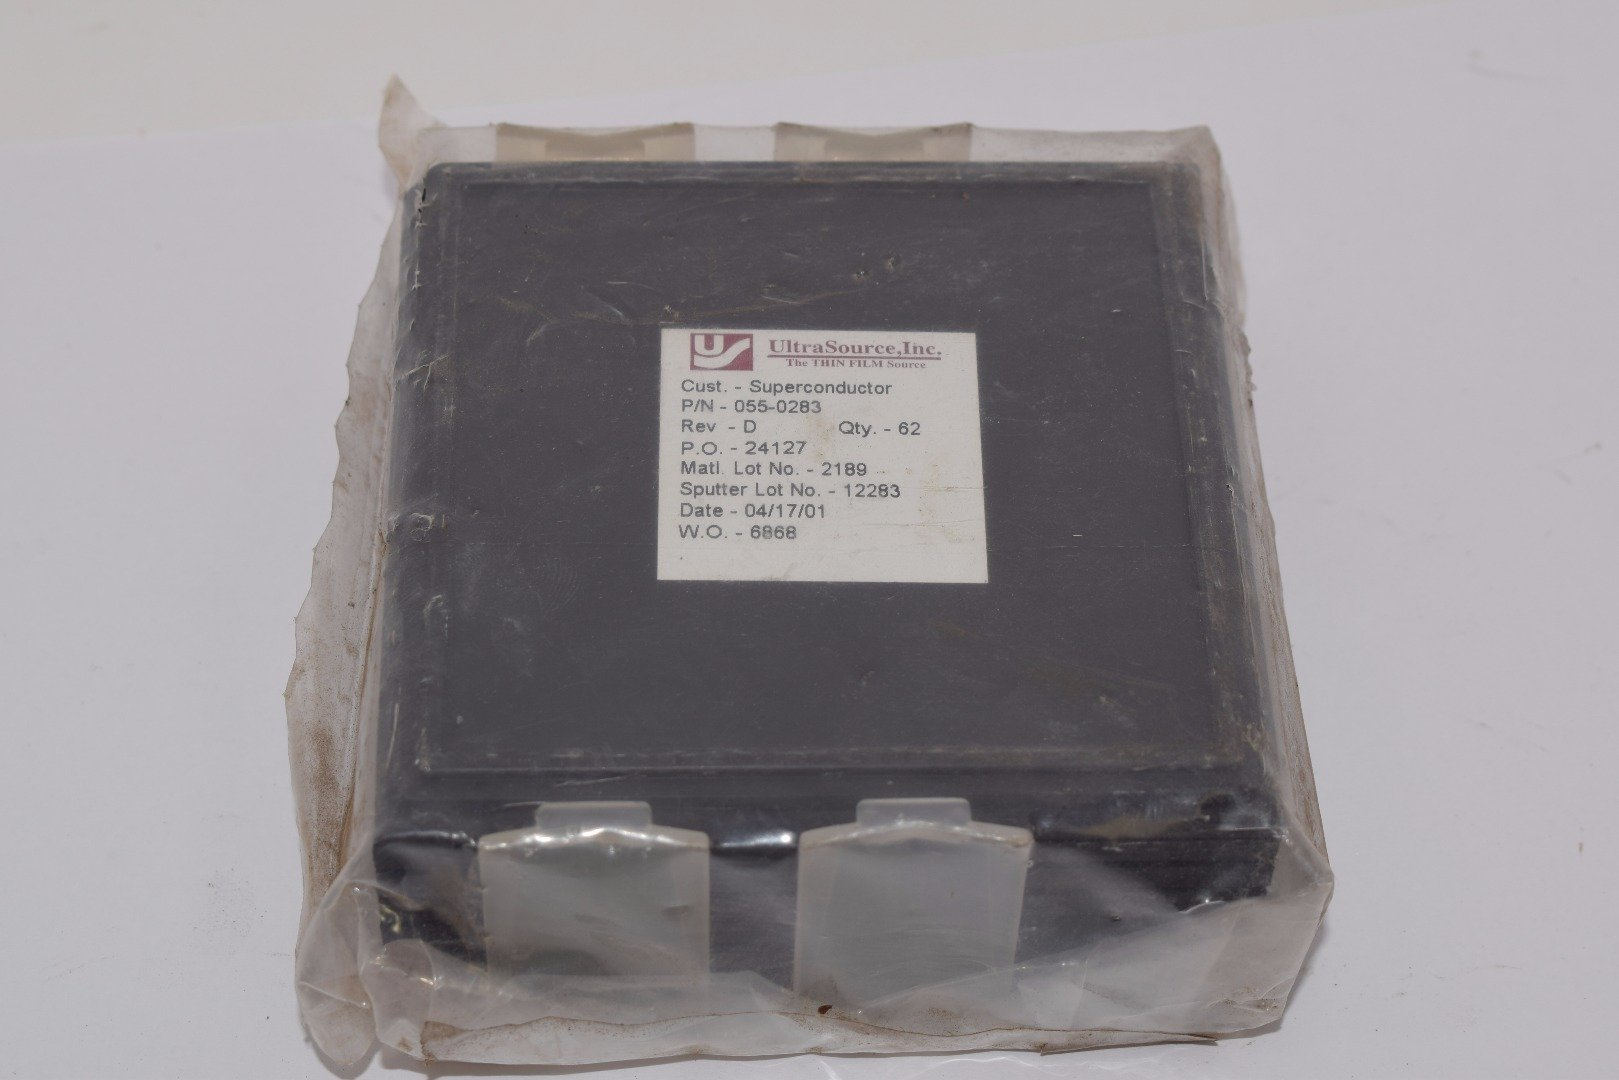 Lot of 62 NEW Superconductor UltraSource 055-0283 Rev D Thin Film Sensor